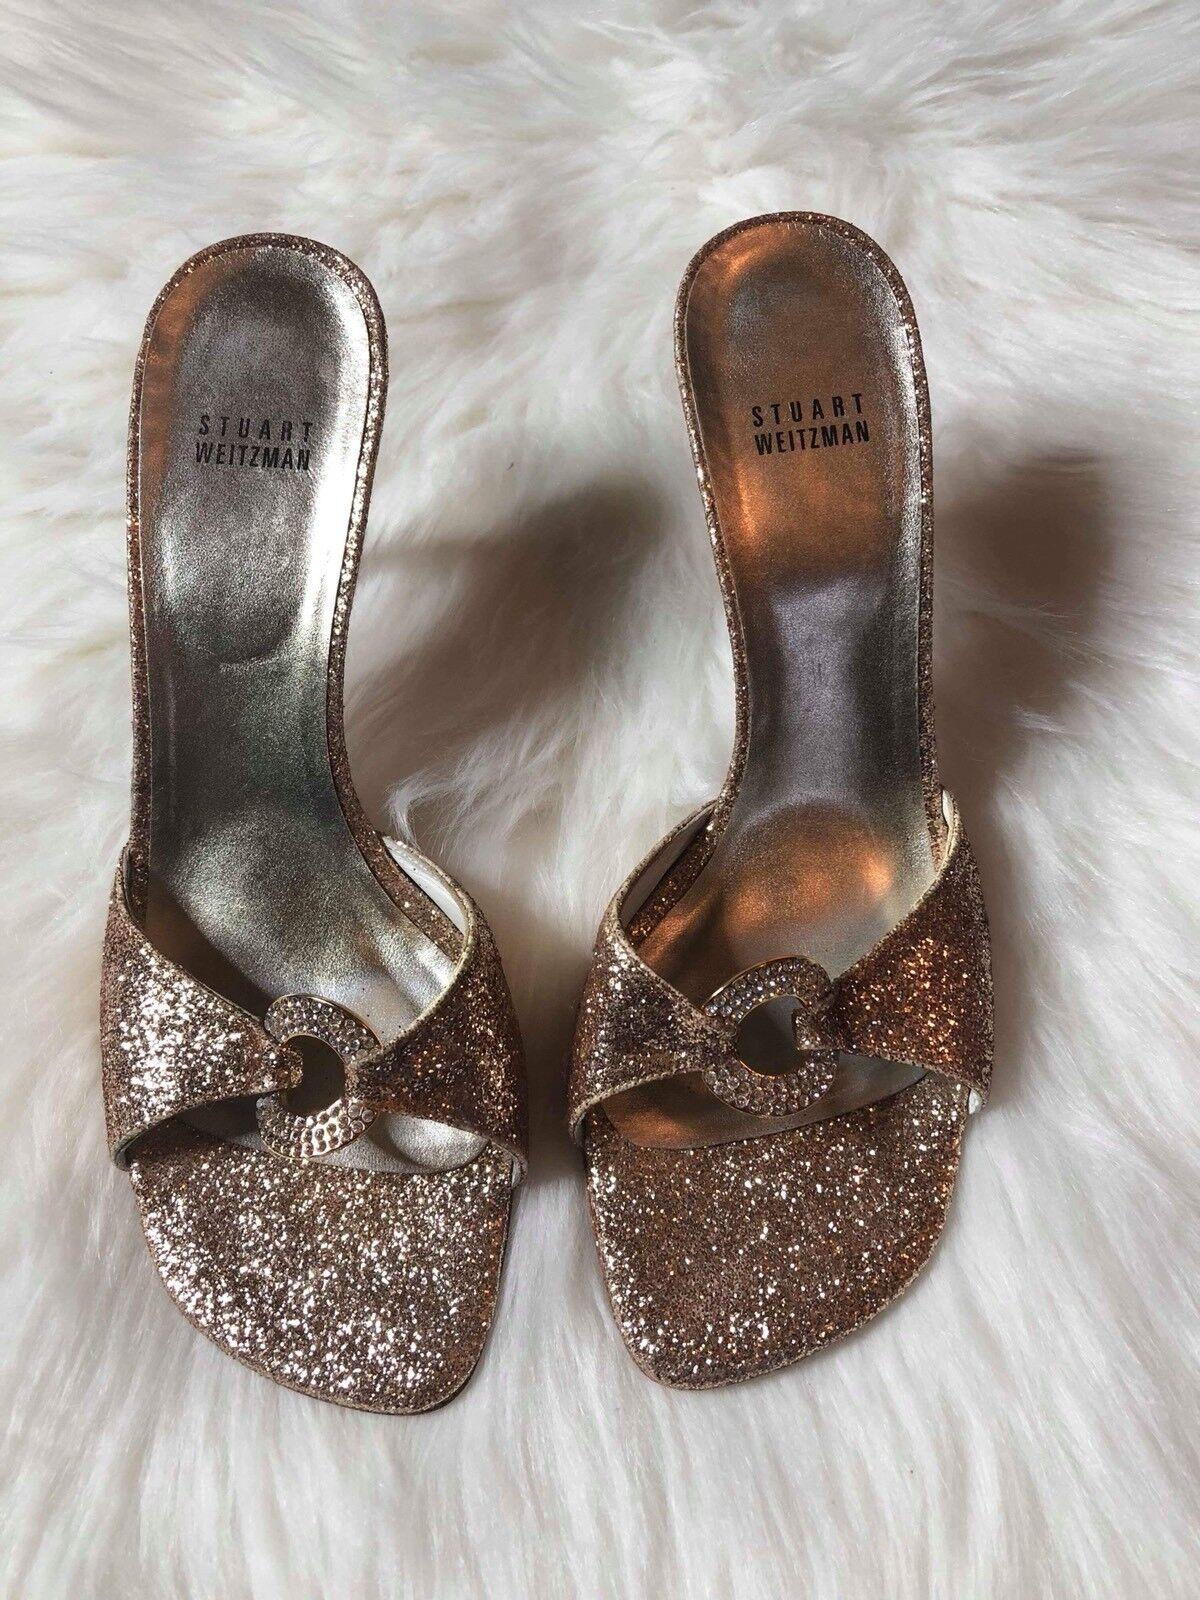 Stuart Weitzman Womens Size 9.5 Medium Mule Pumps gold Glitter Rhinestones